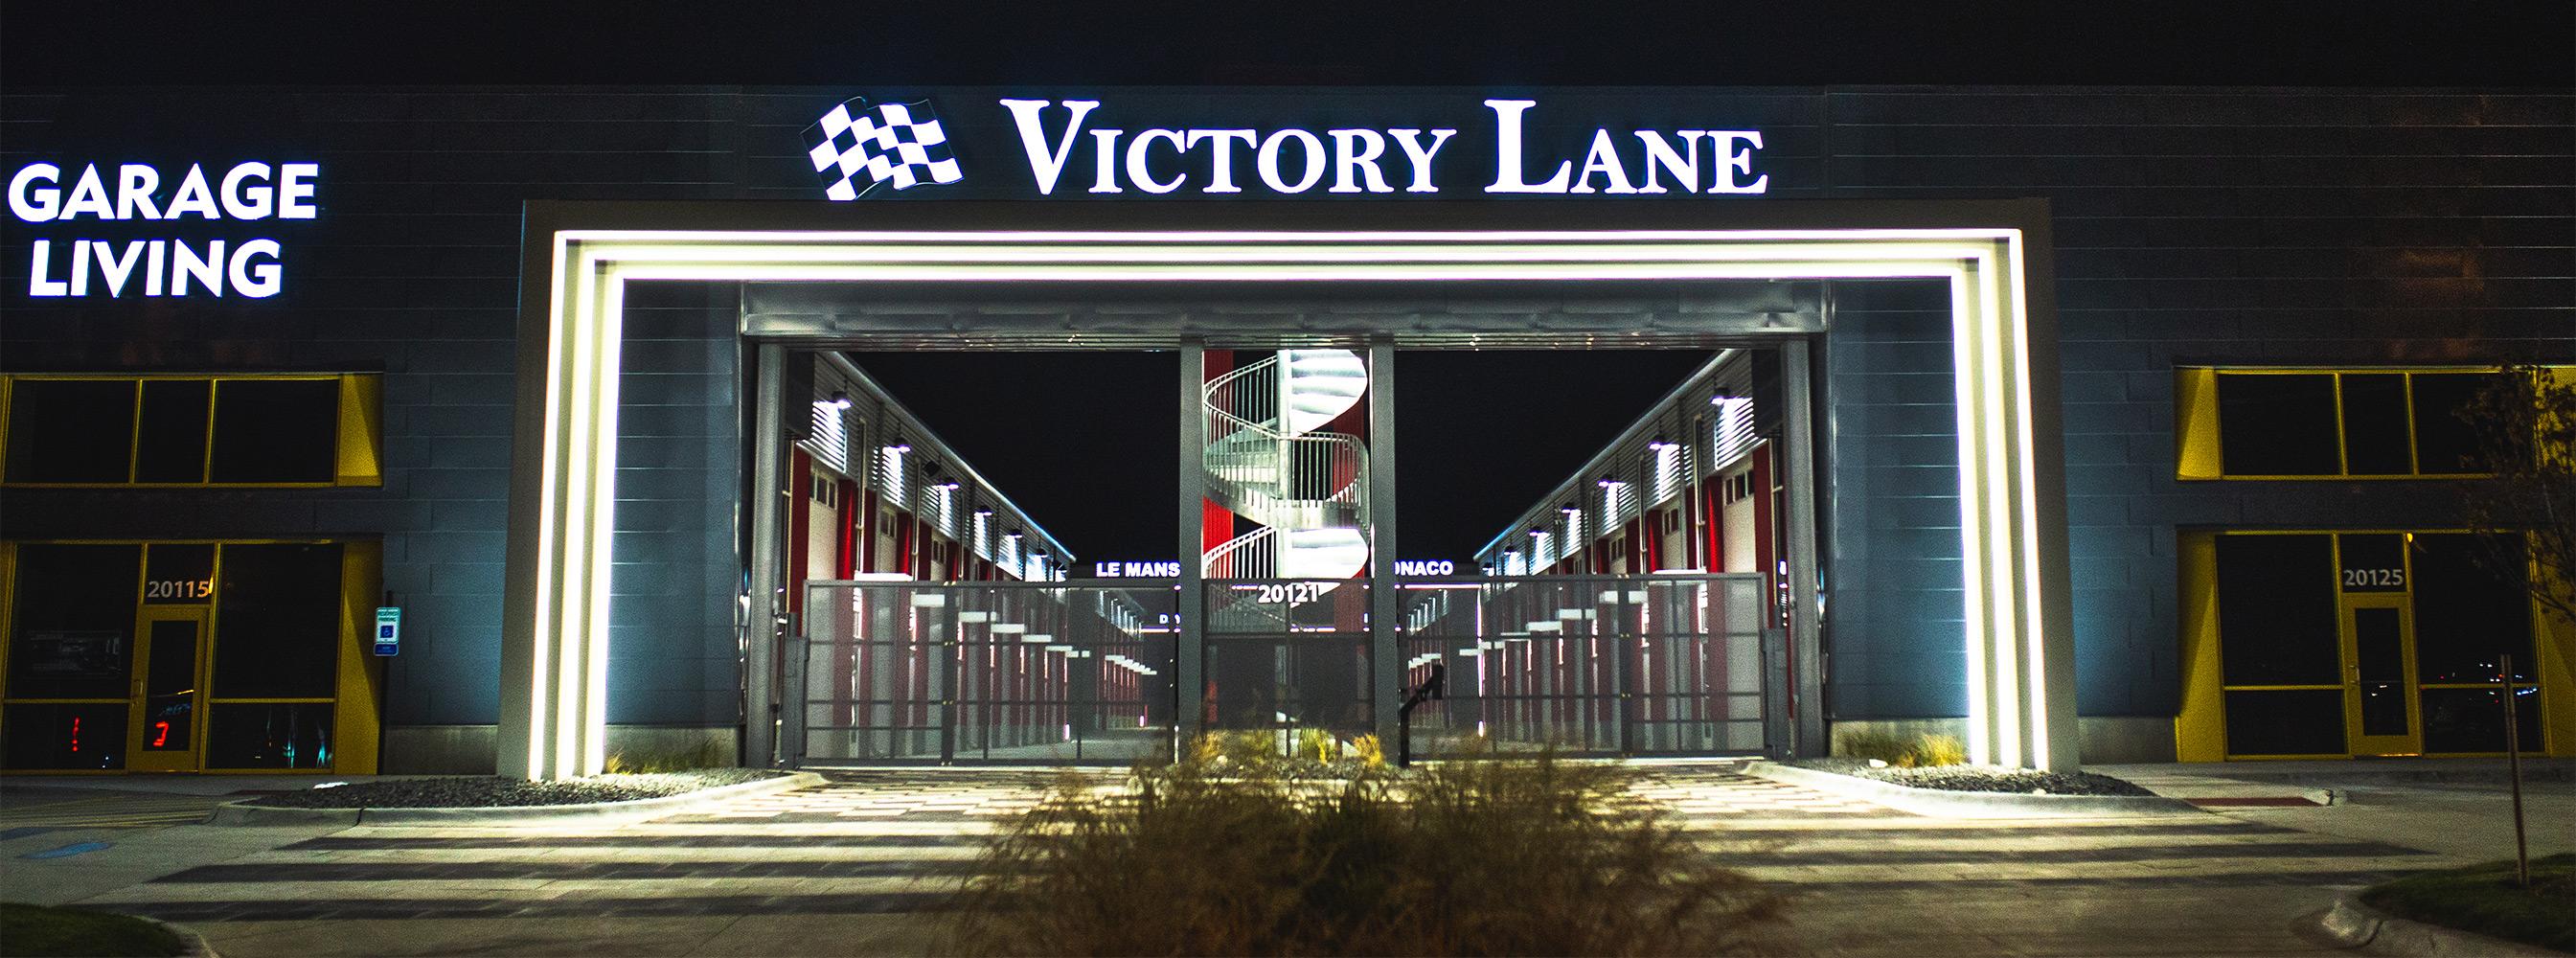 victory-lane_1000px_1